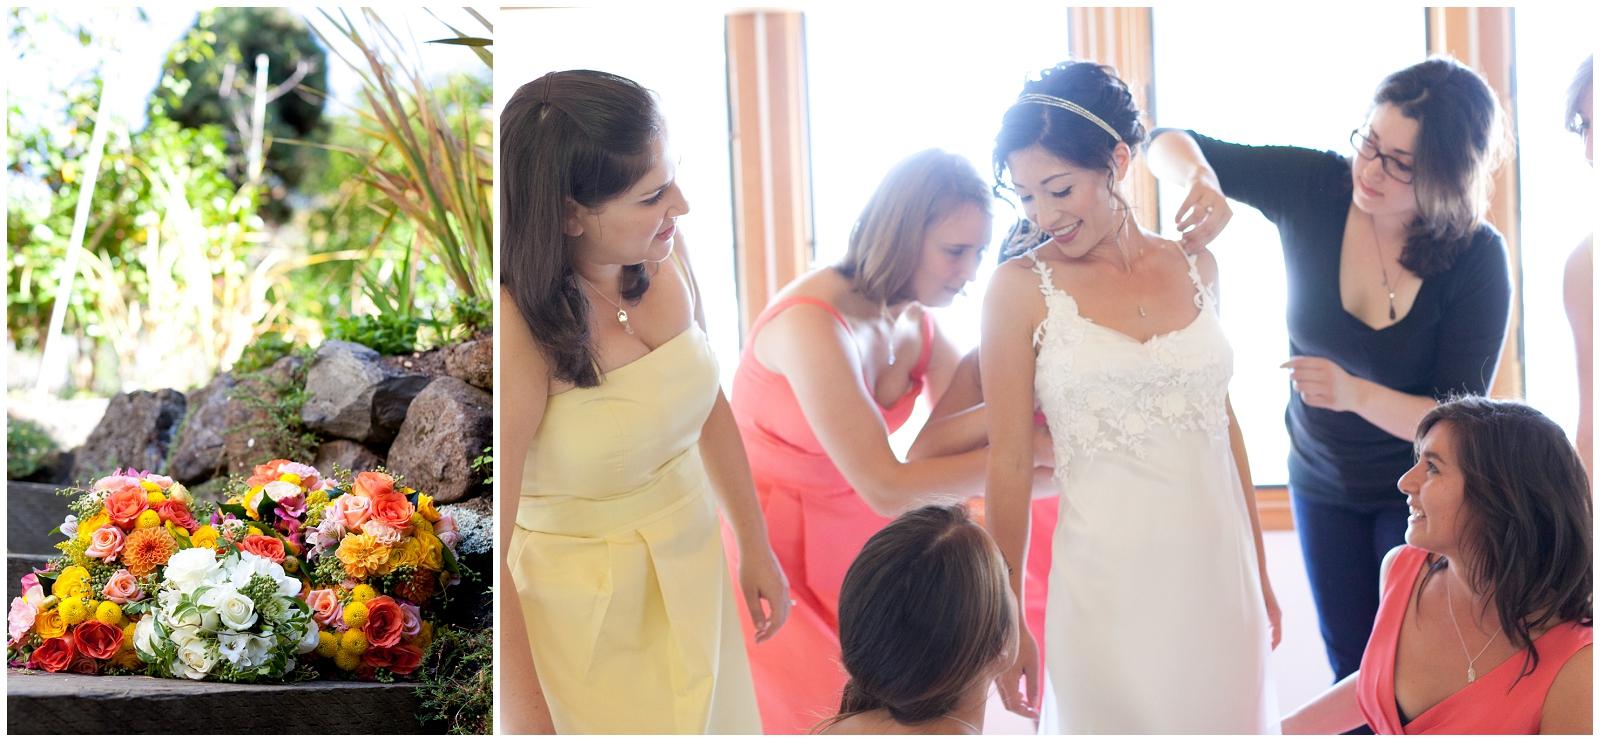 San-Francisco-Bay-Area-Wedding-Photography-Brazilian-Room-2.jpg